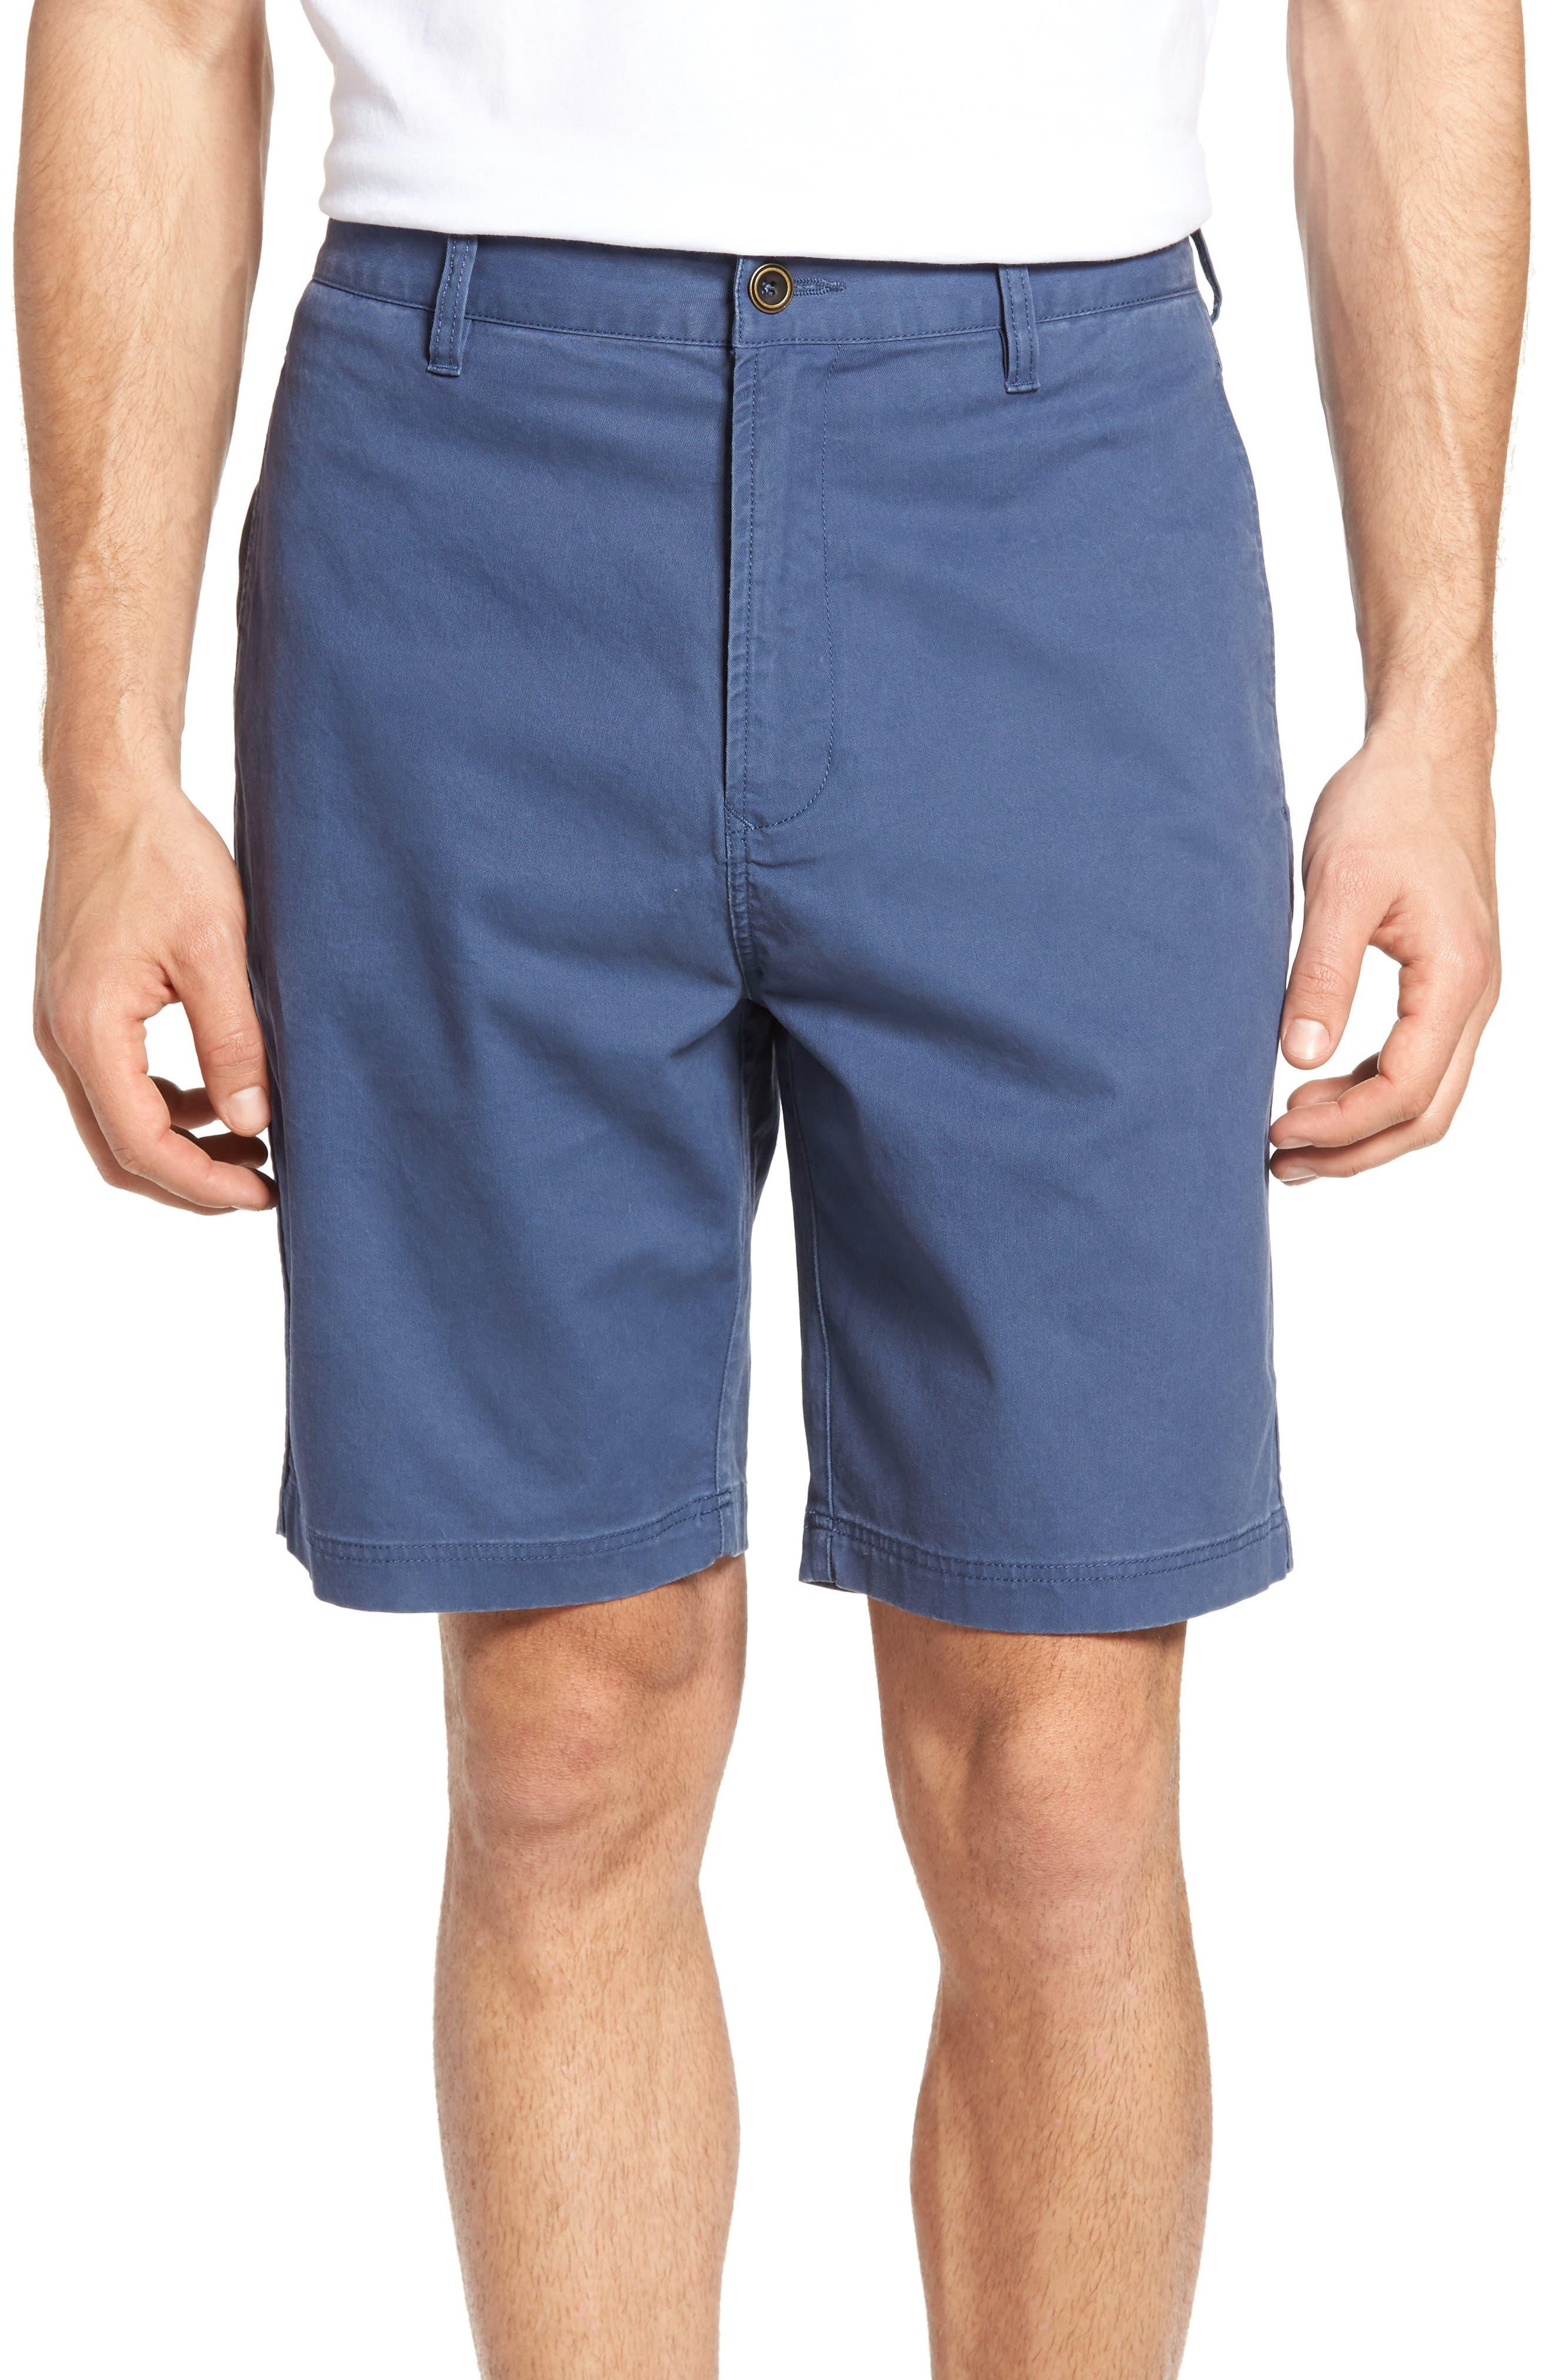 Glenburn Shorts,                             Main thumbnail 1, color,                             Indigo